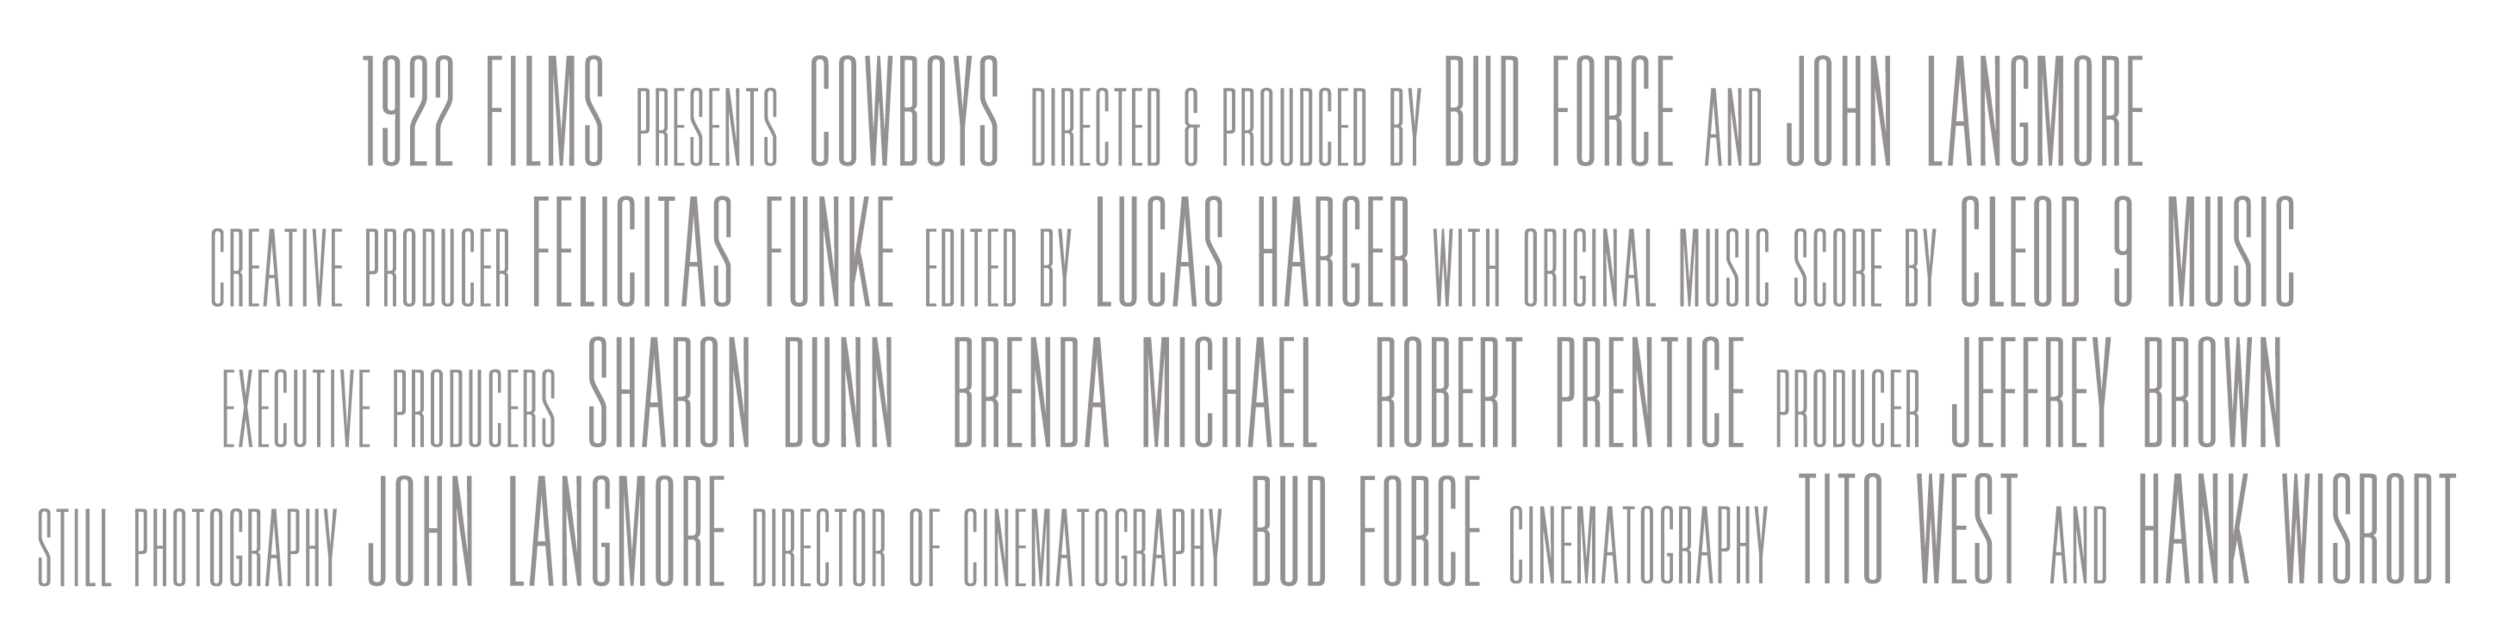 CowboysDocumentary_BudForce_Credits_0619.png